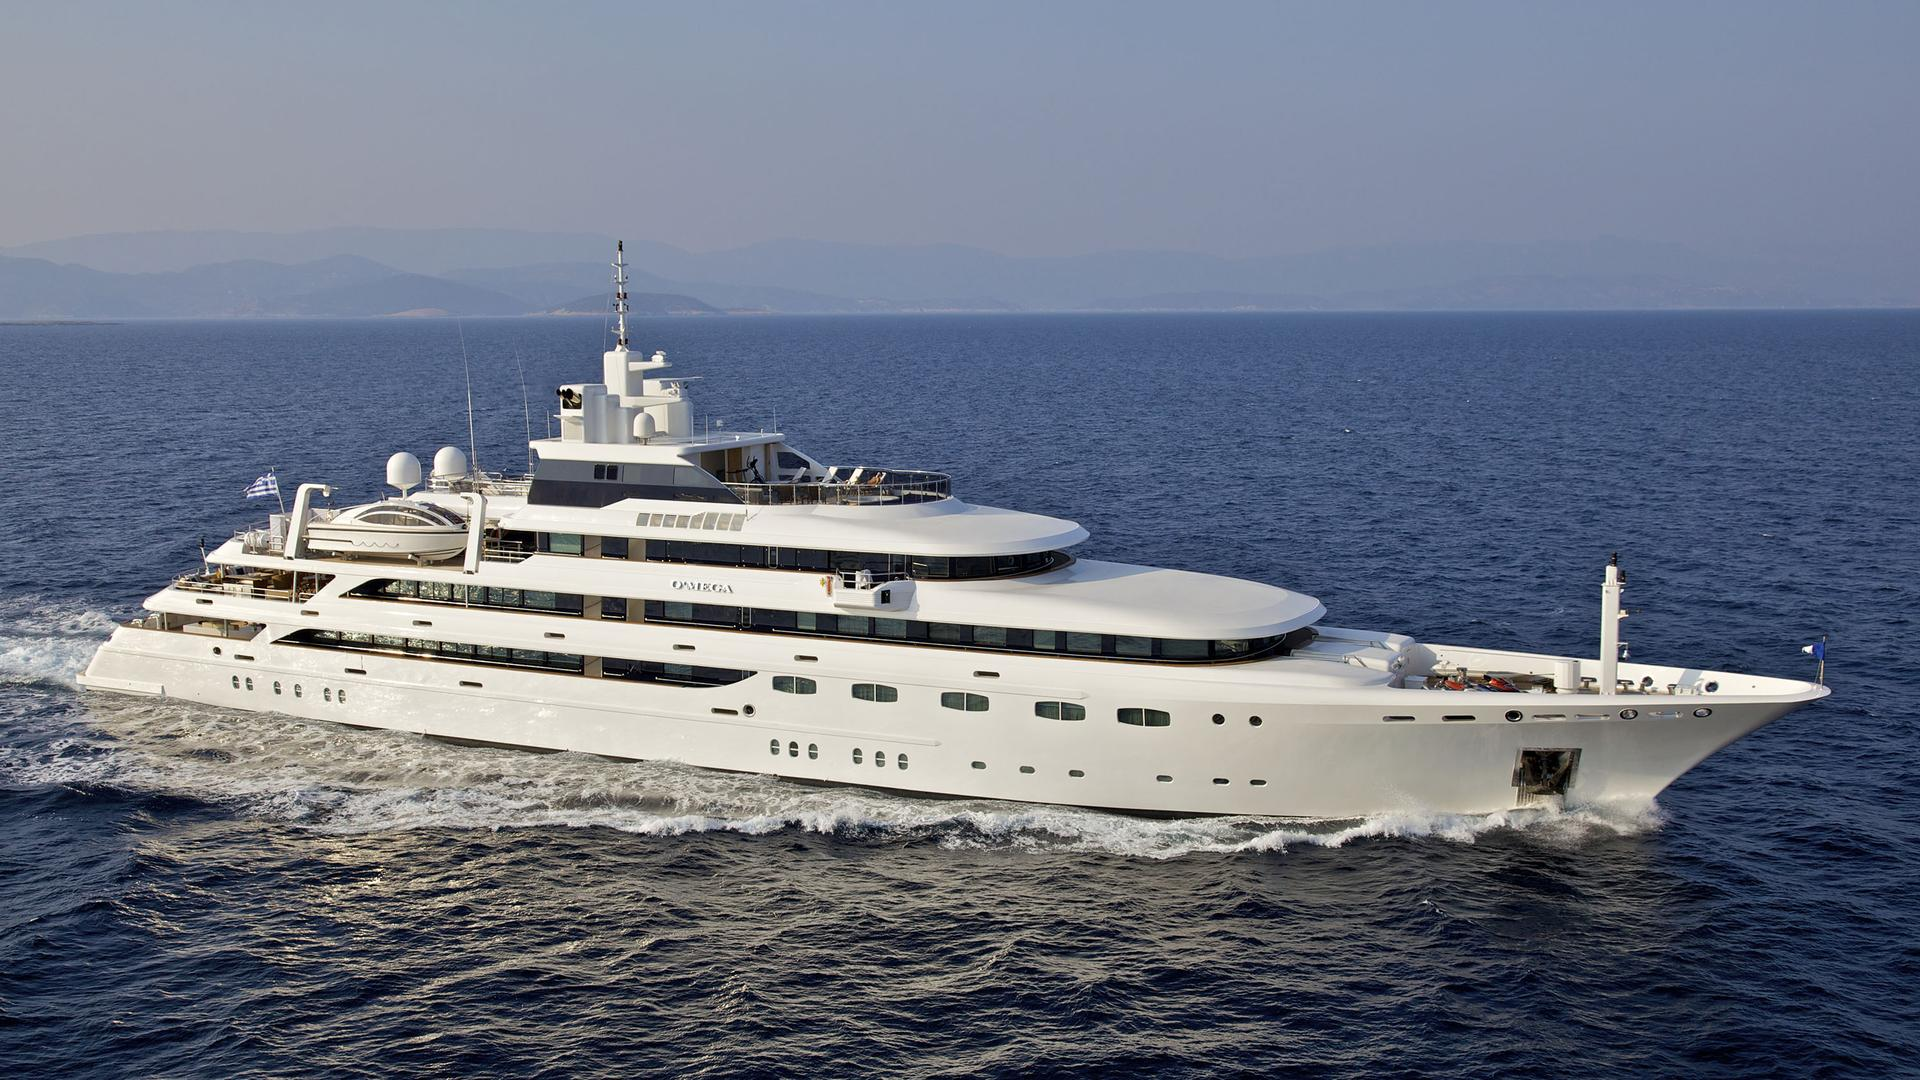 OMega Super Yacht (271 feet) • Luxury Motor Yachts ...